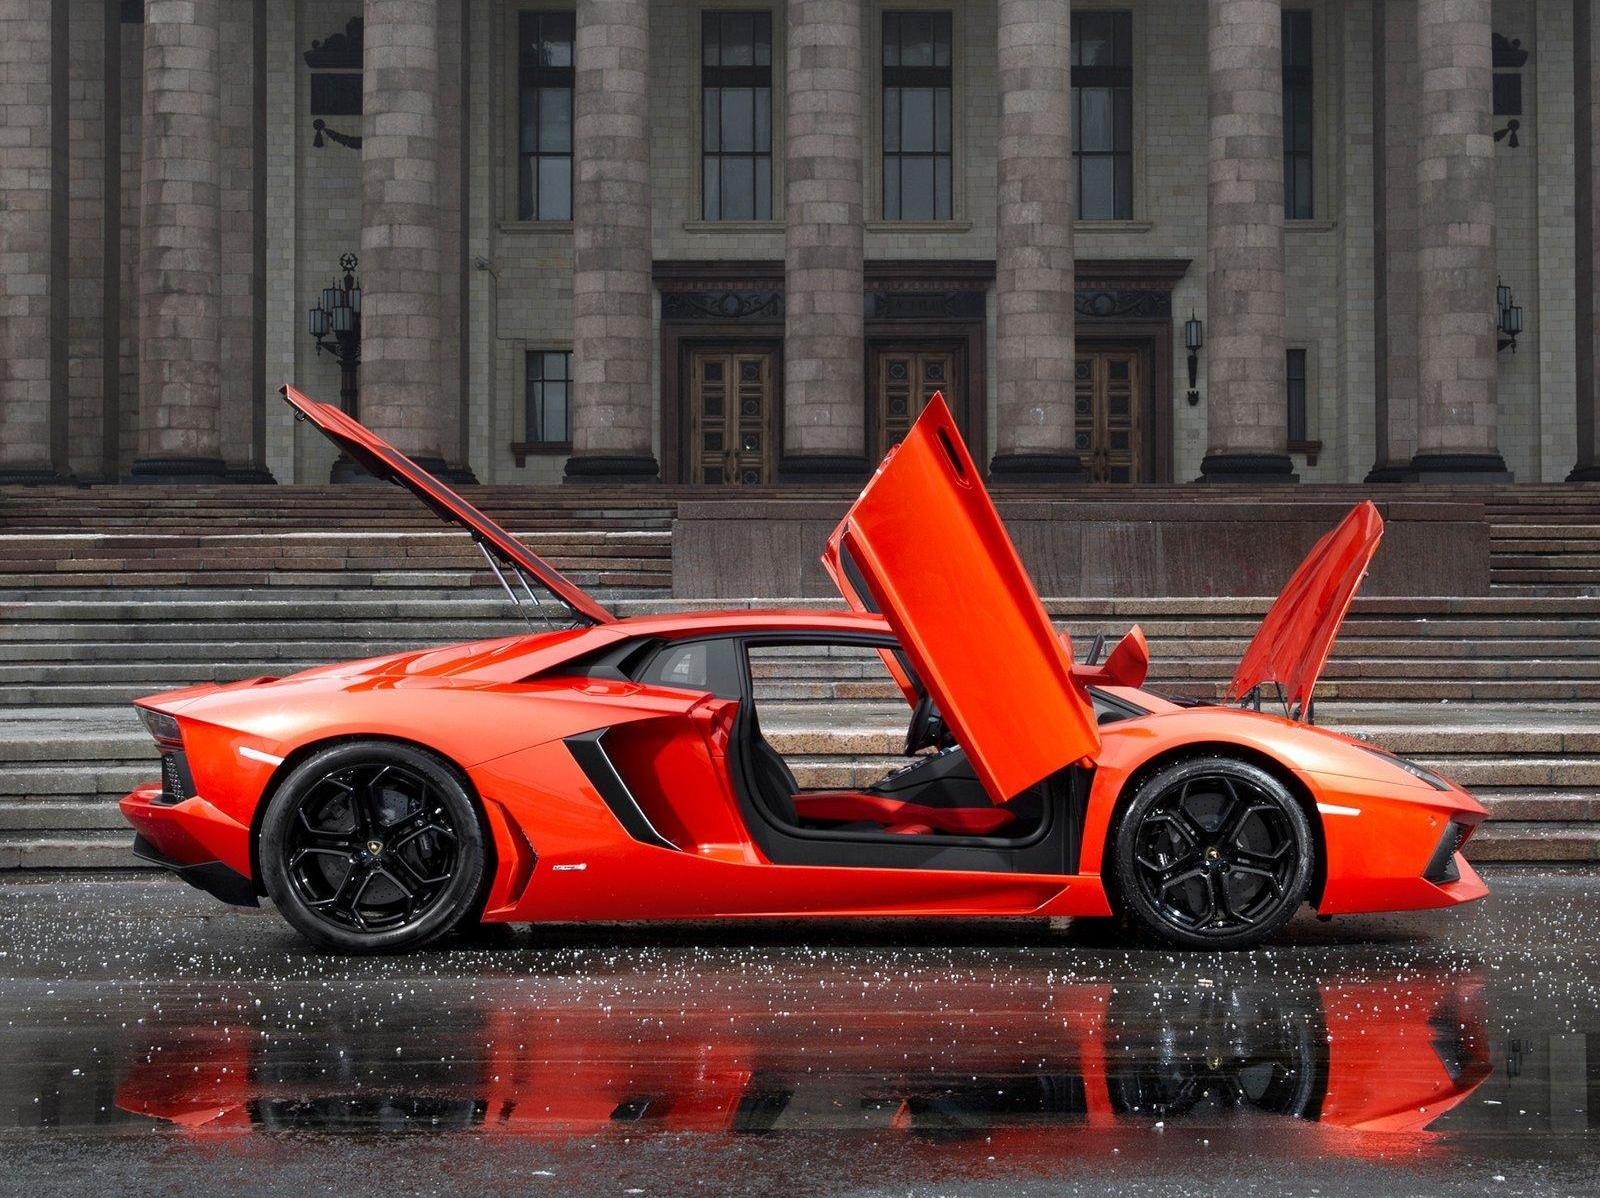 Lamborghini Aventador S First Drive. Four-wheel steer is the tech-du-jour but thus far no one has pushed it like Lamborghini ... the scissor doors ... & Lamborghini aventador red car lovely door open ~ Gallery ...